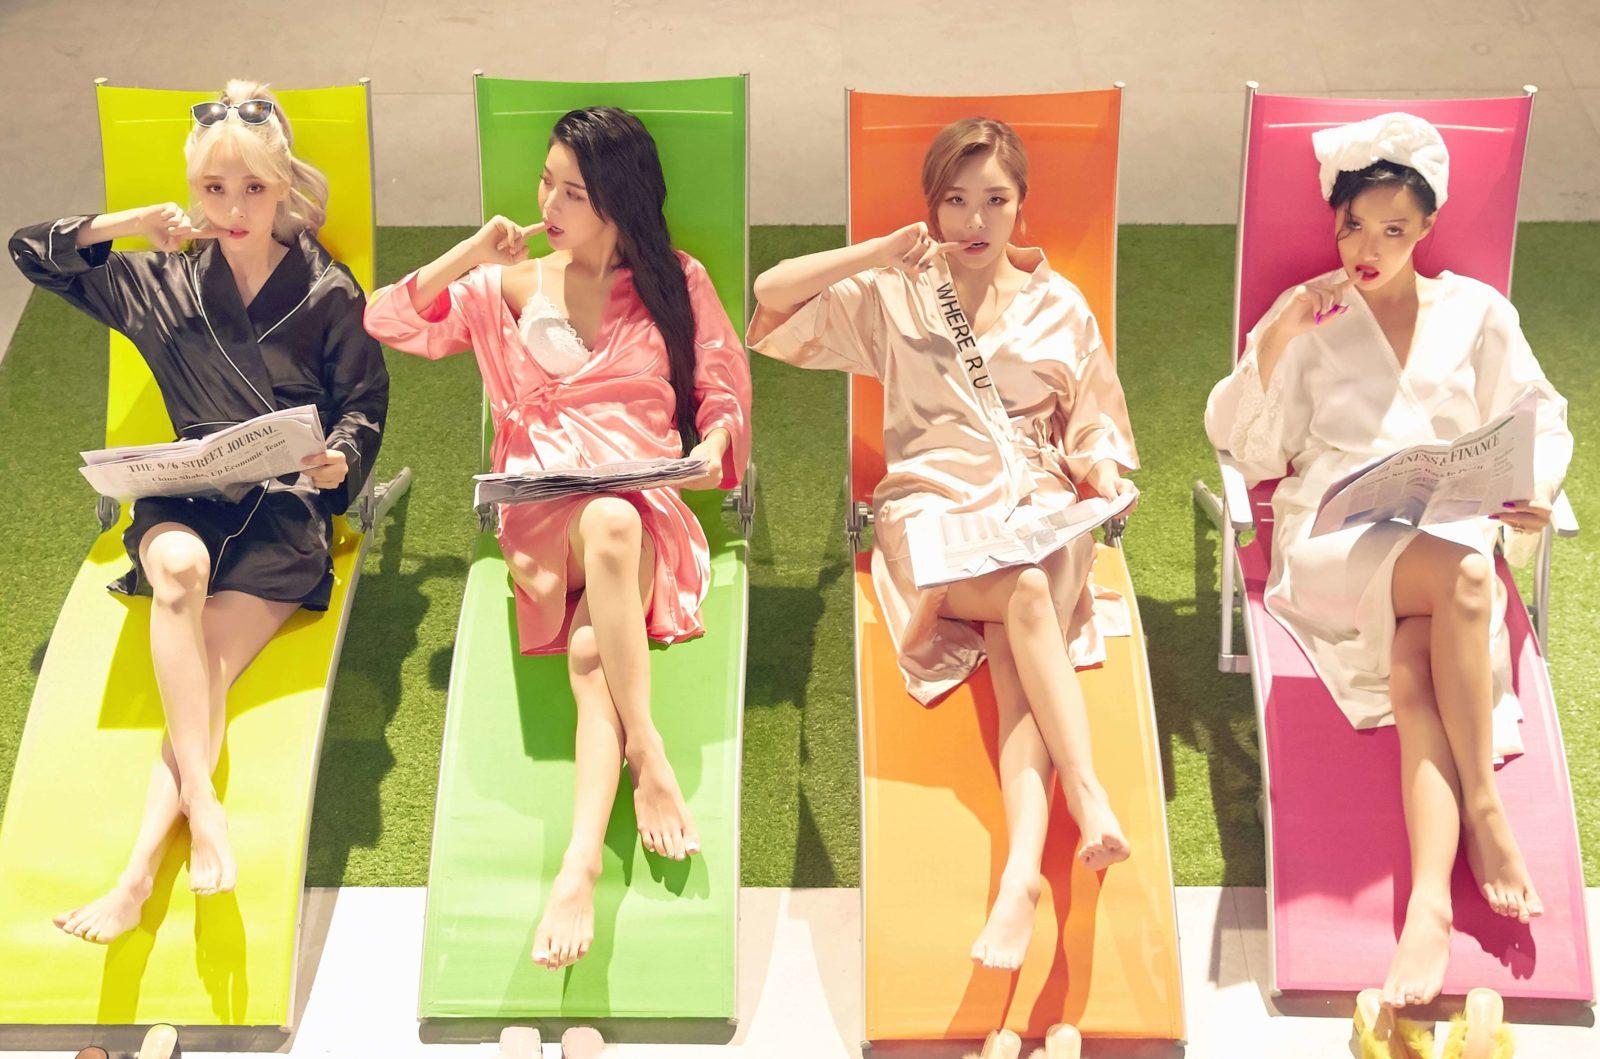 MAMAMOO、韓国で連続リリースされた最新ミニアルバム4作品が日本での配信解禁決定サムネイル画像